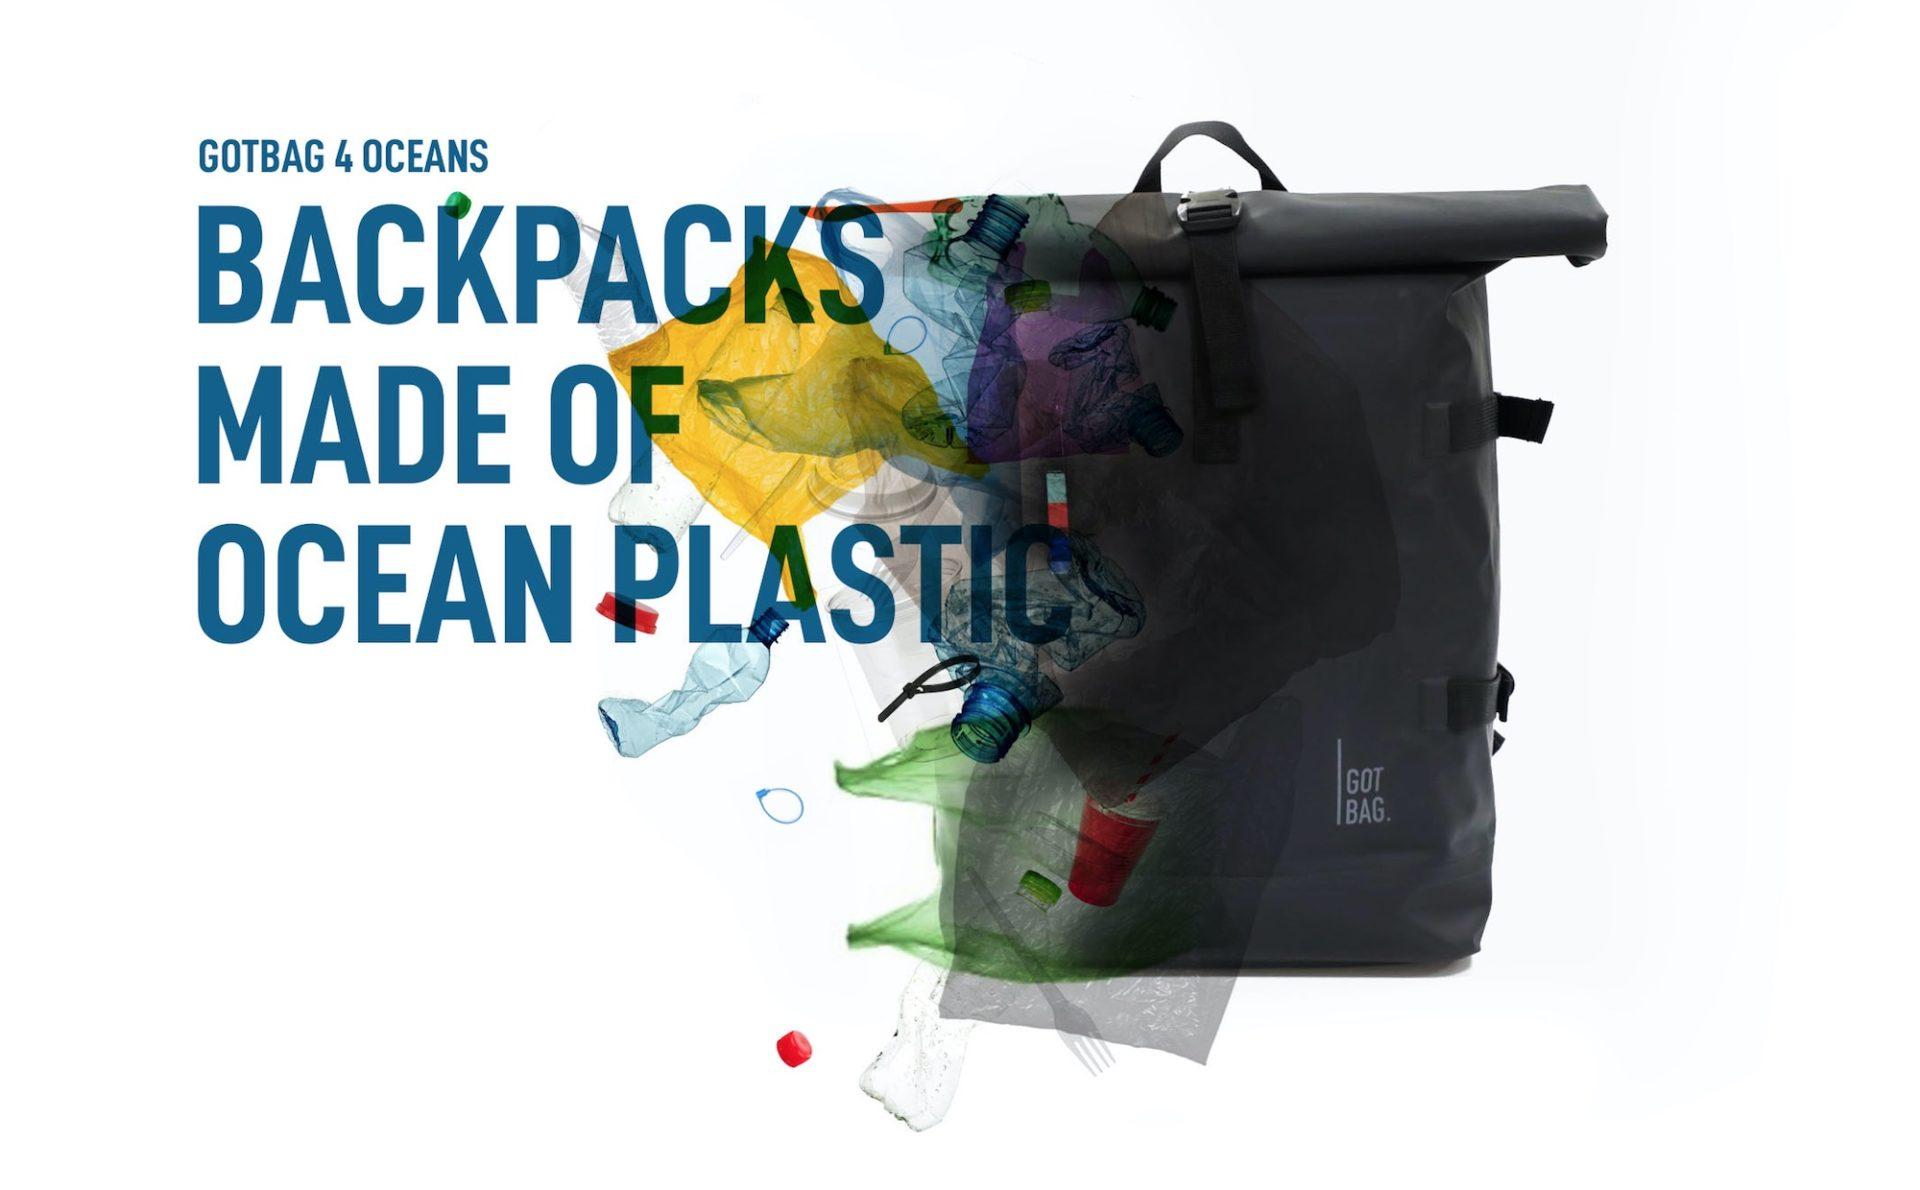 got-bag-rucksack